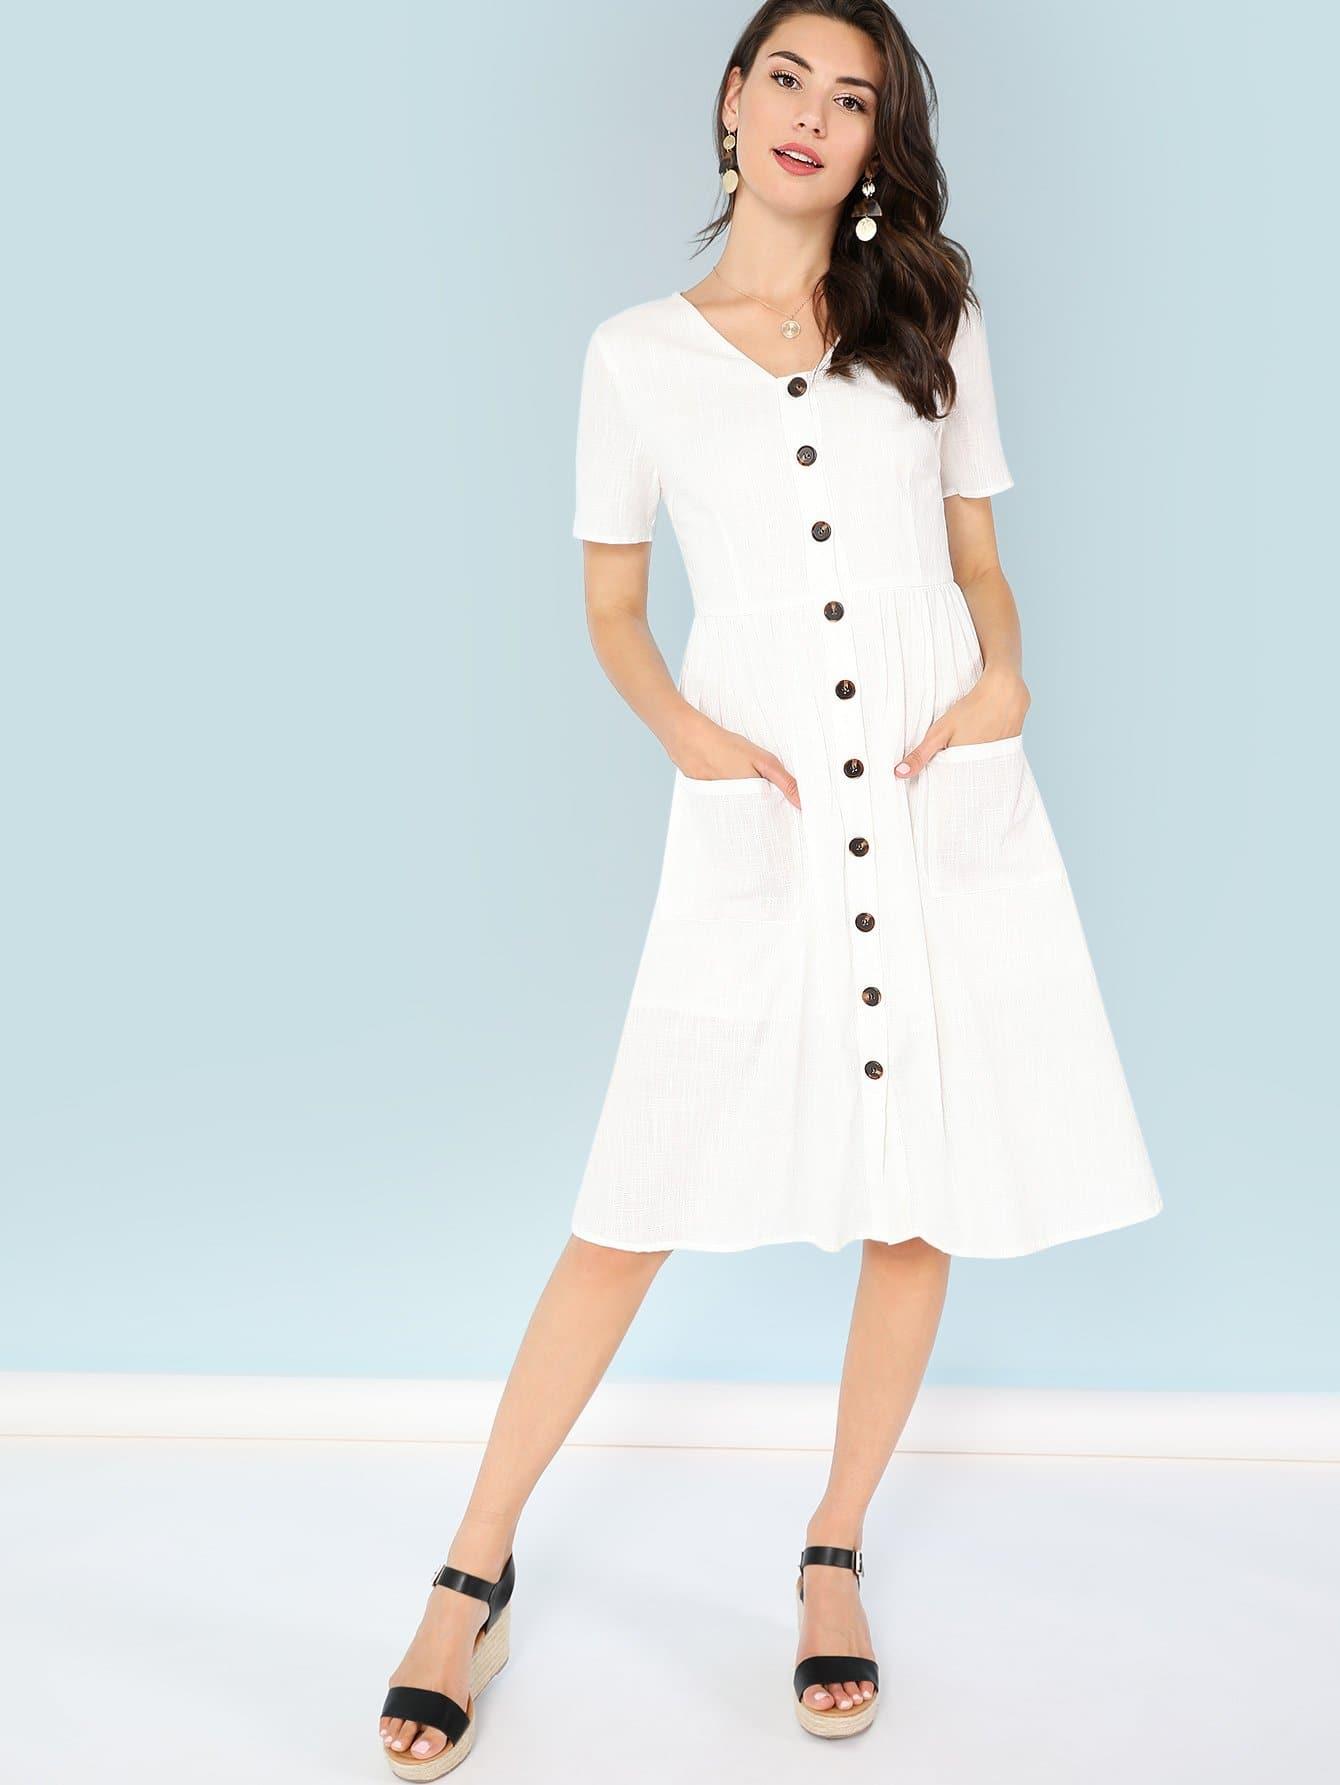 Купить Платье с пуговицами, Zandria Theis, SheIn